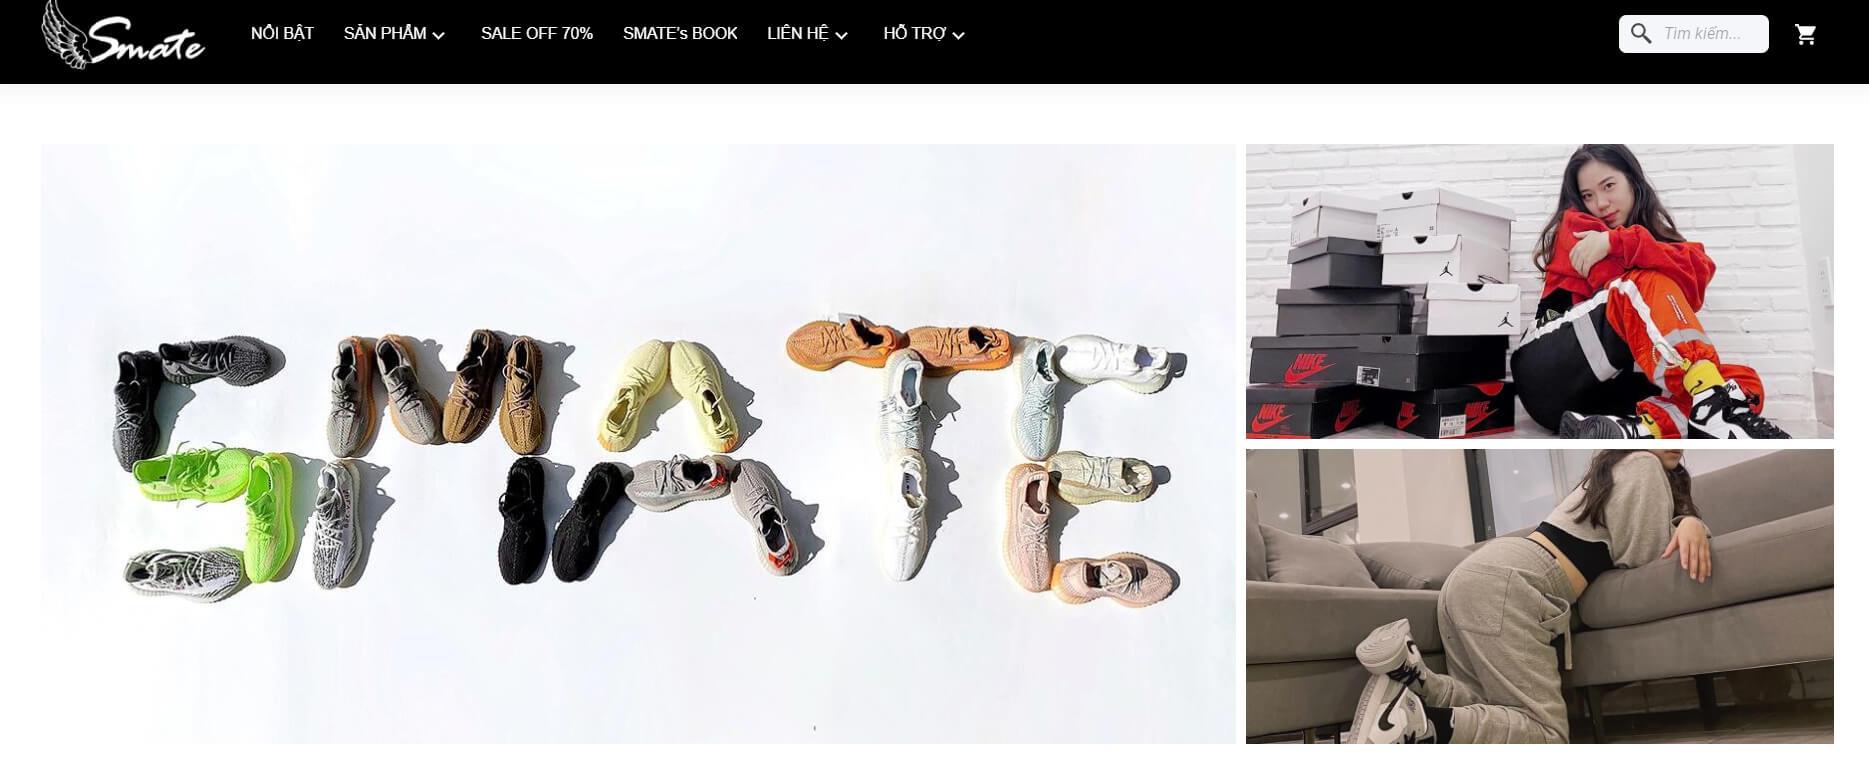 website smate store